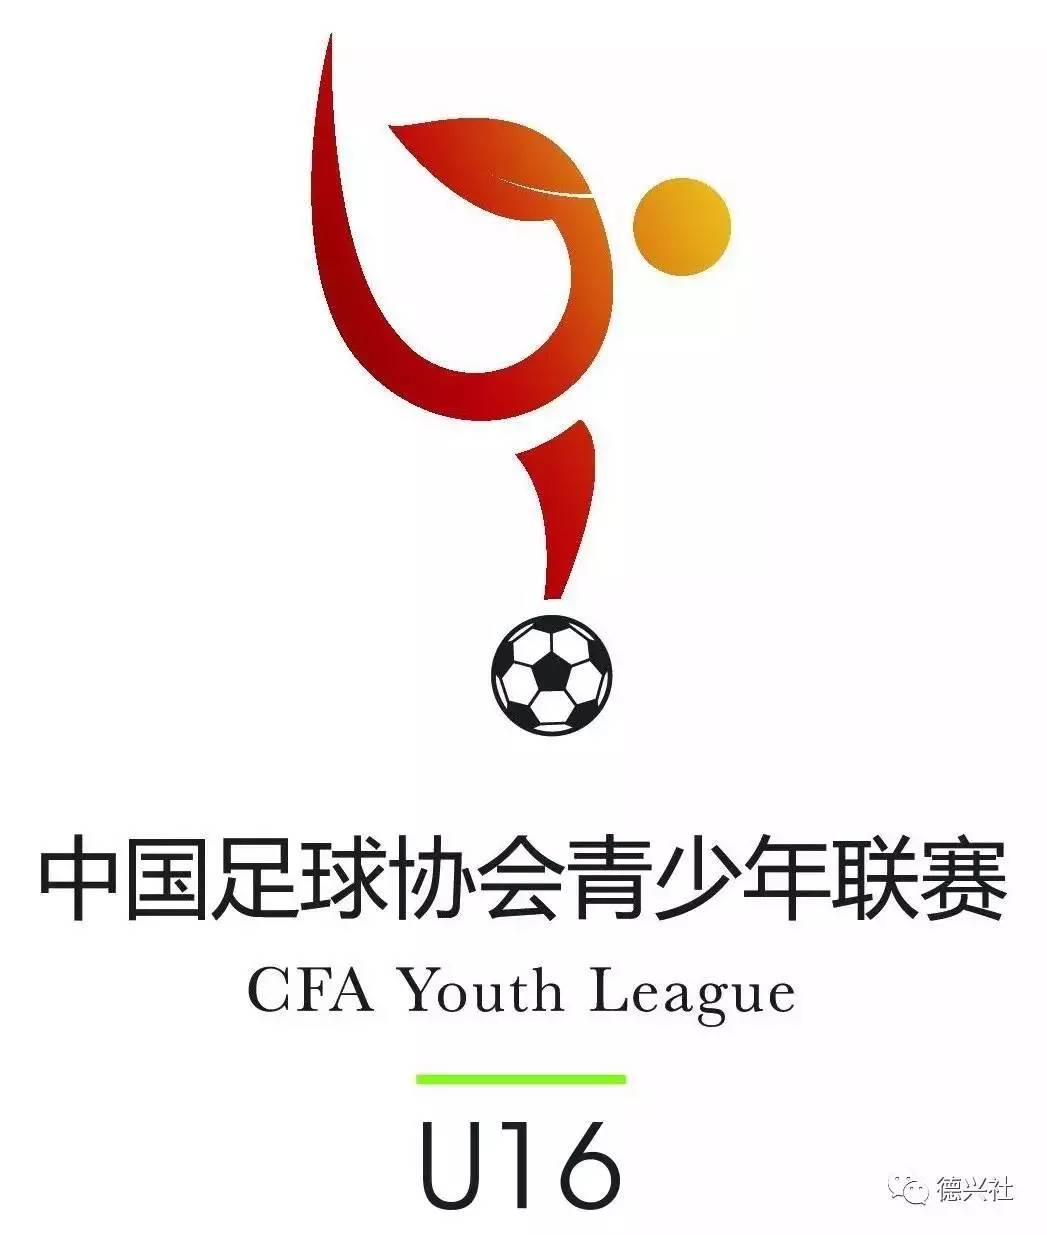 U16联赛第三阶段第三轮●新疆江苏三连胜 鲁能三连平